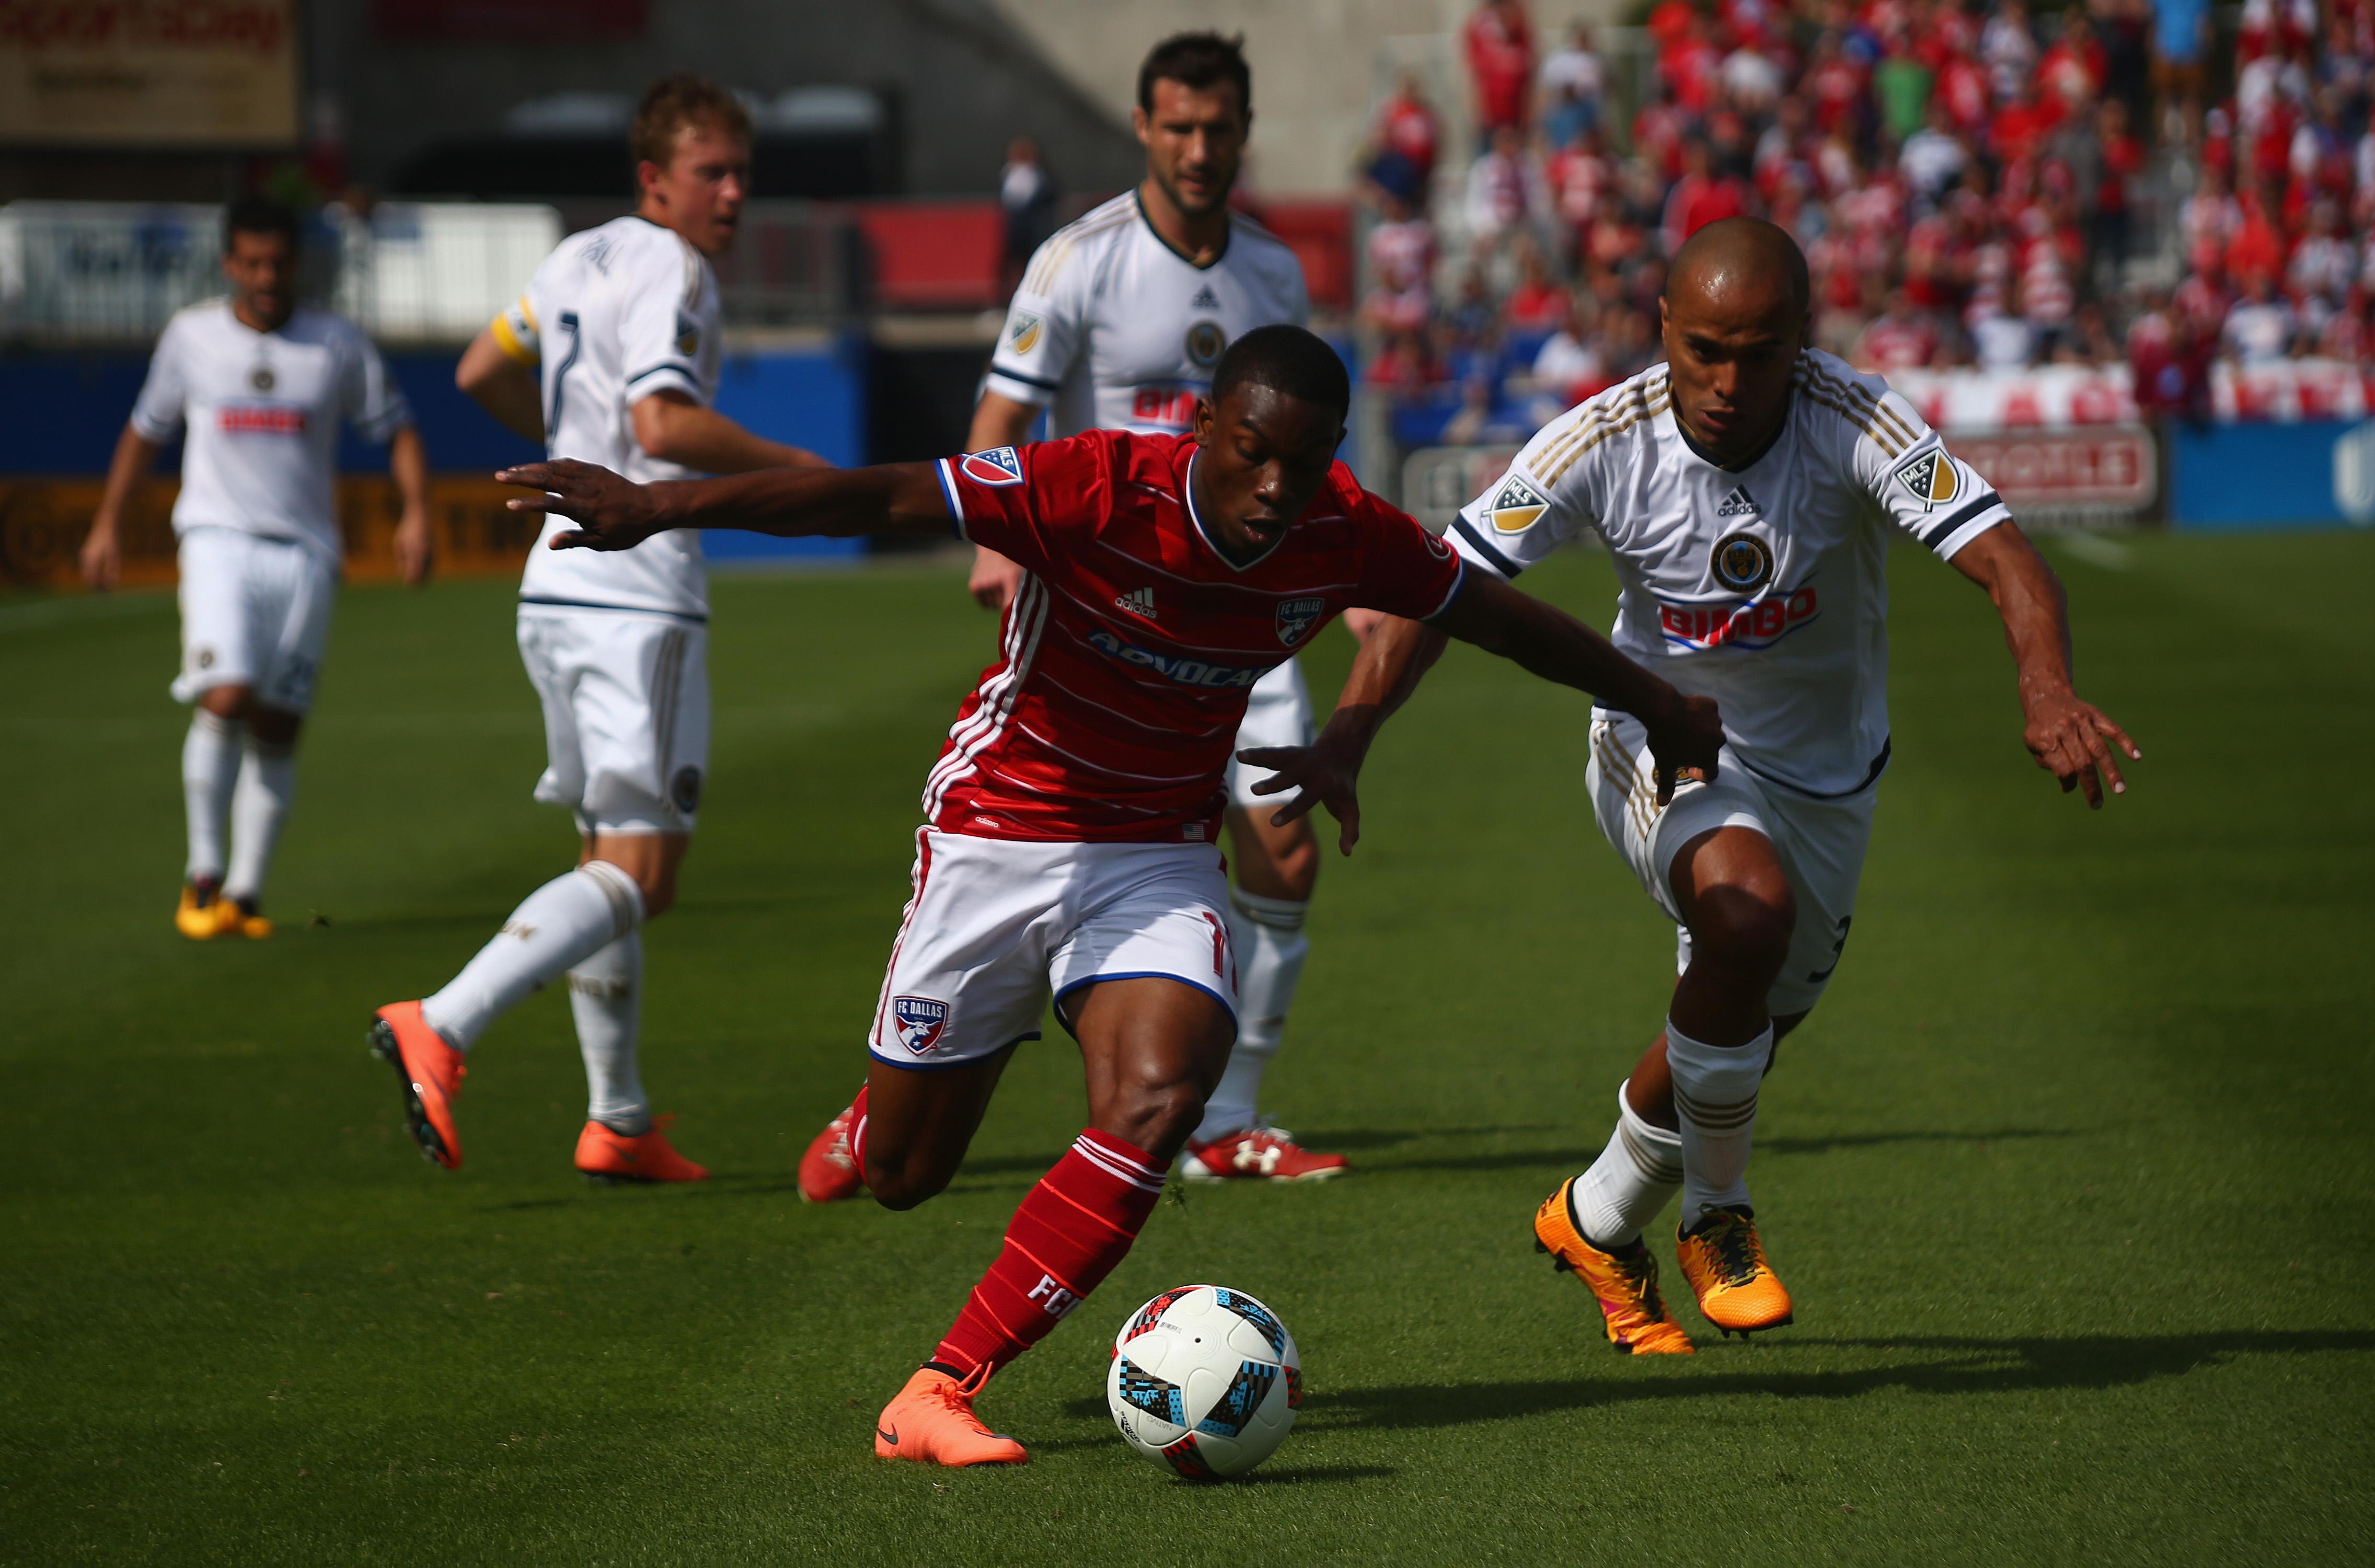 FC Dallas' Fabian Castillo dribbles past the Philadelphia Union's Fabinho.